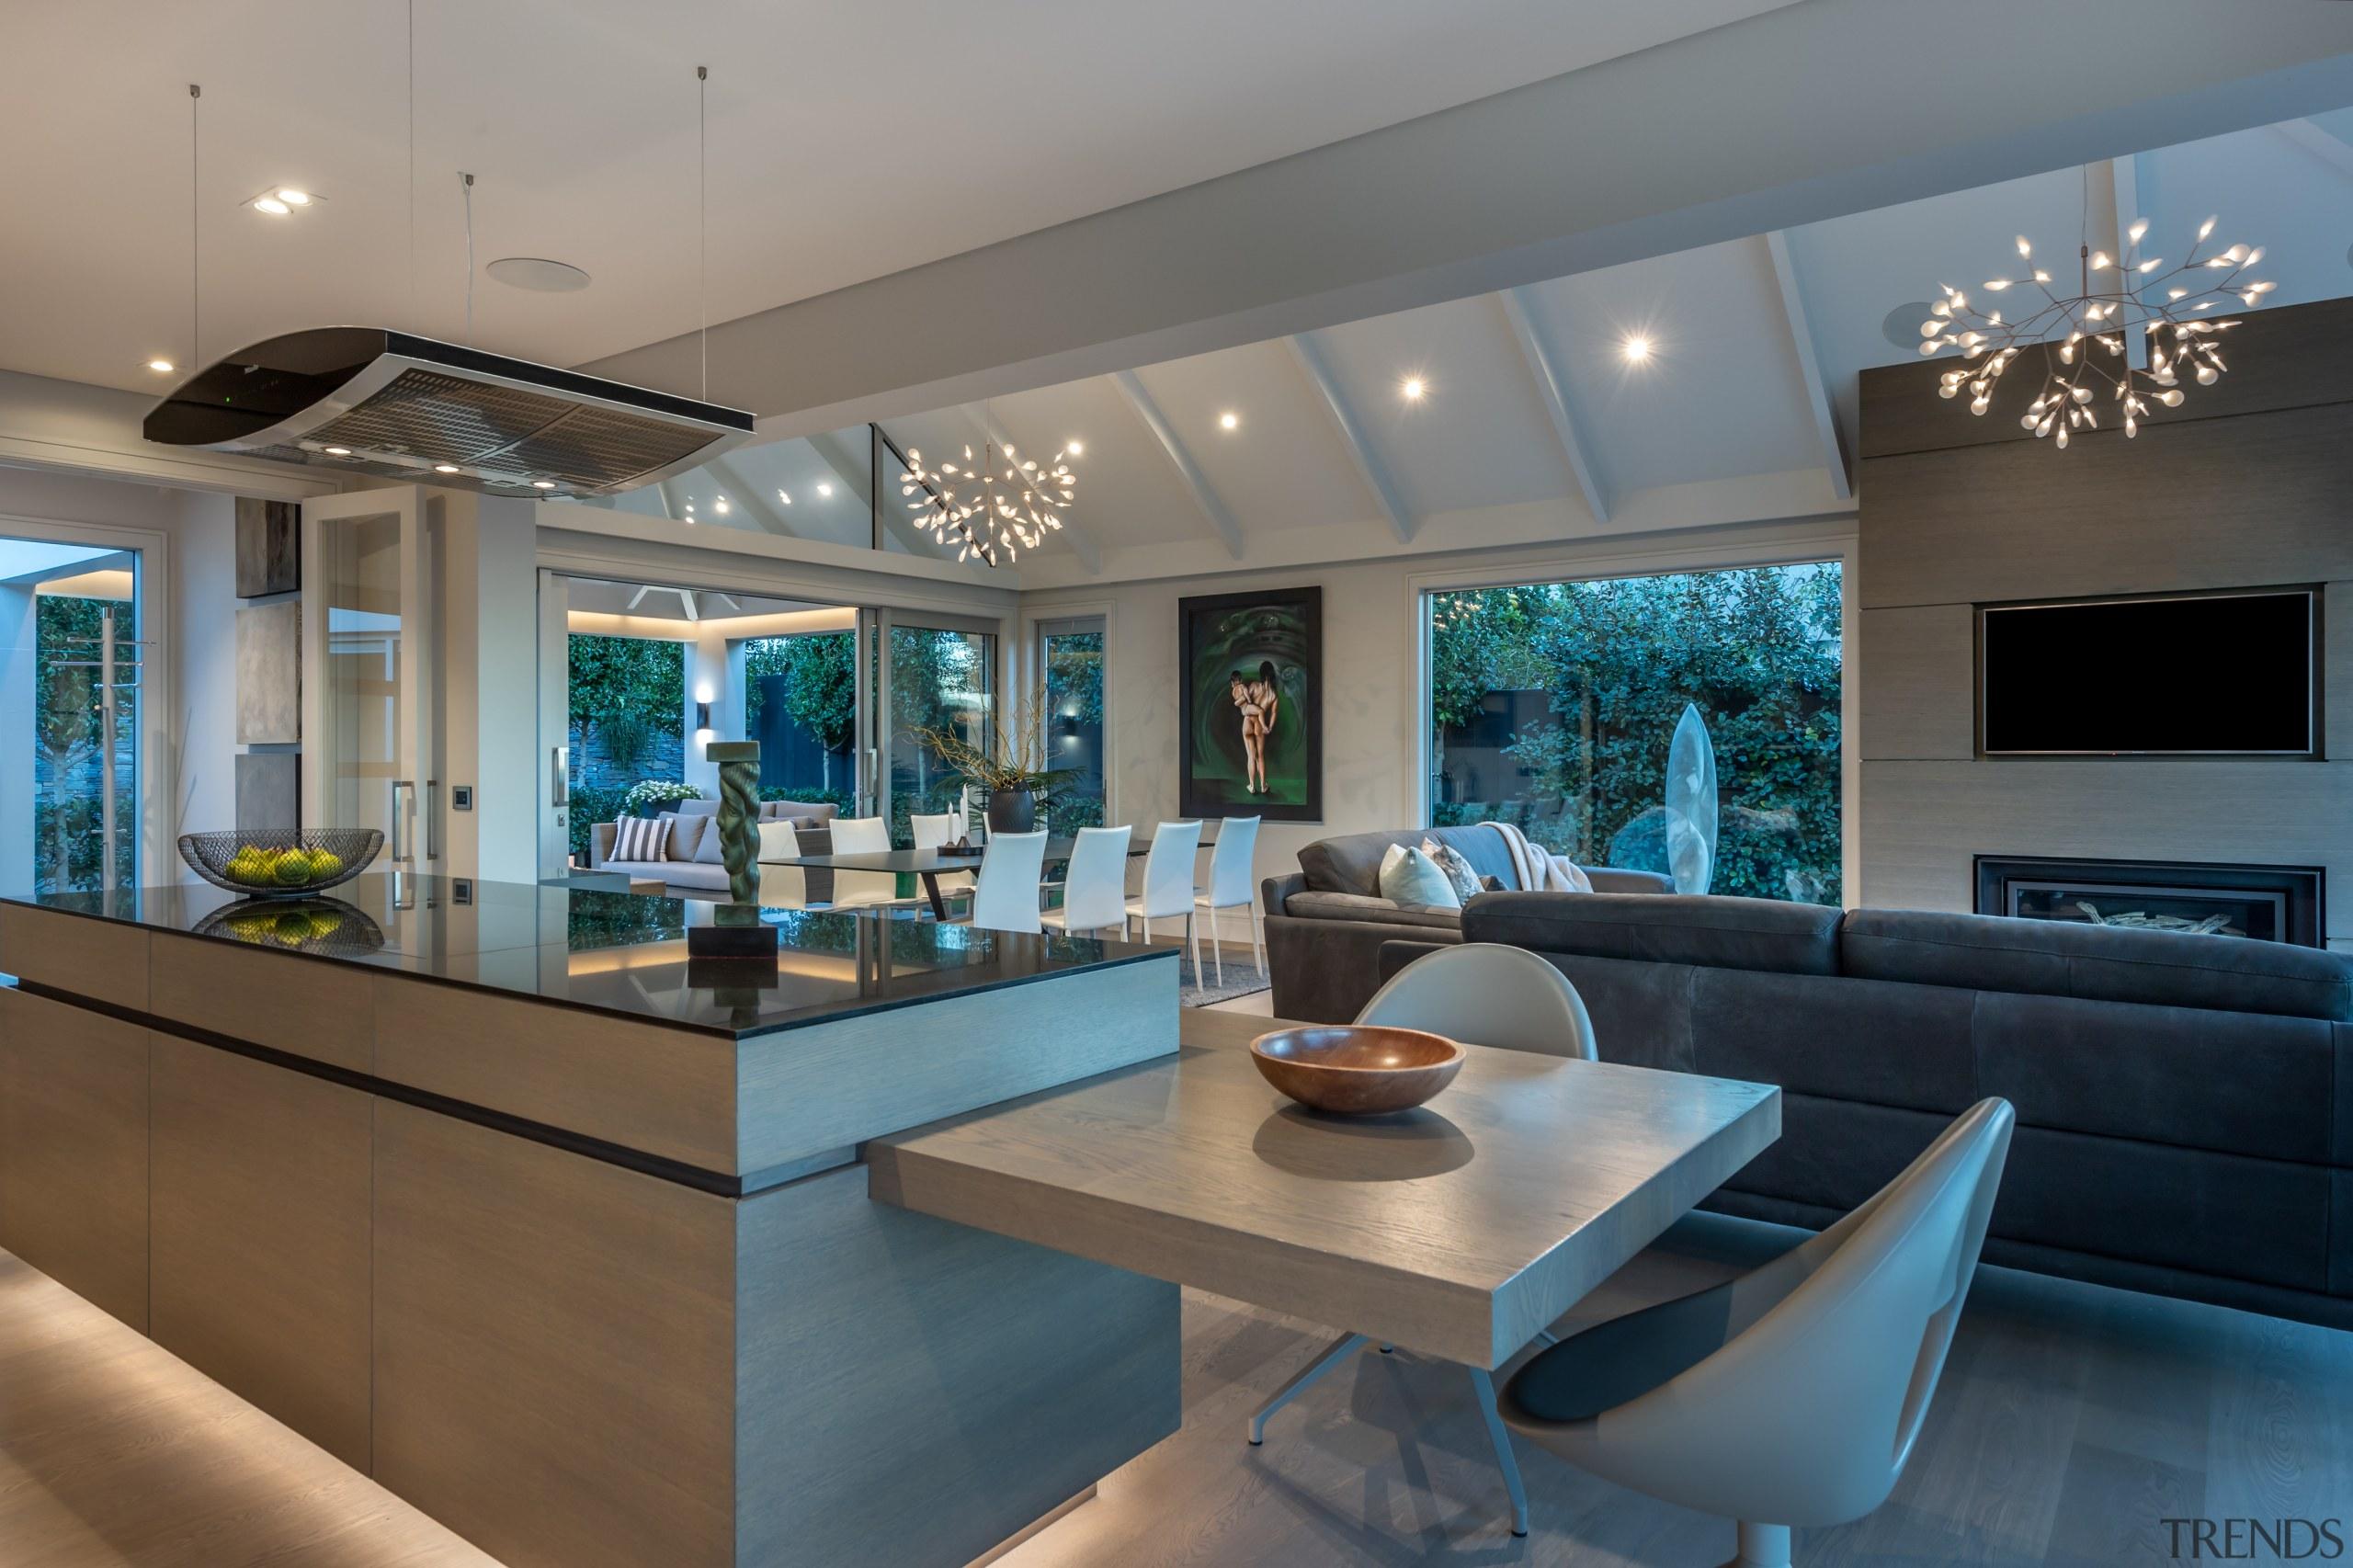 Sculptural, star-burst lighting pendants in this living space